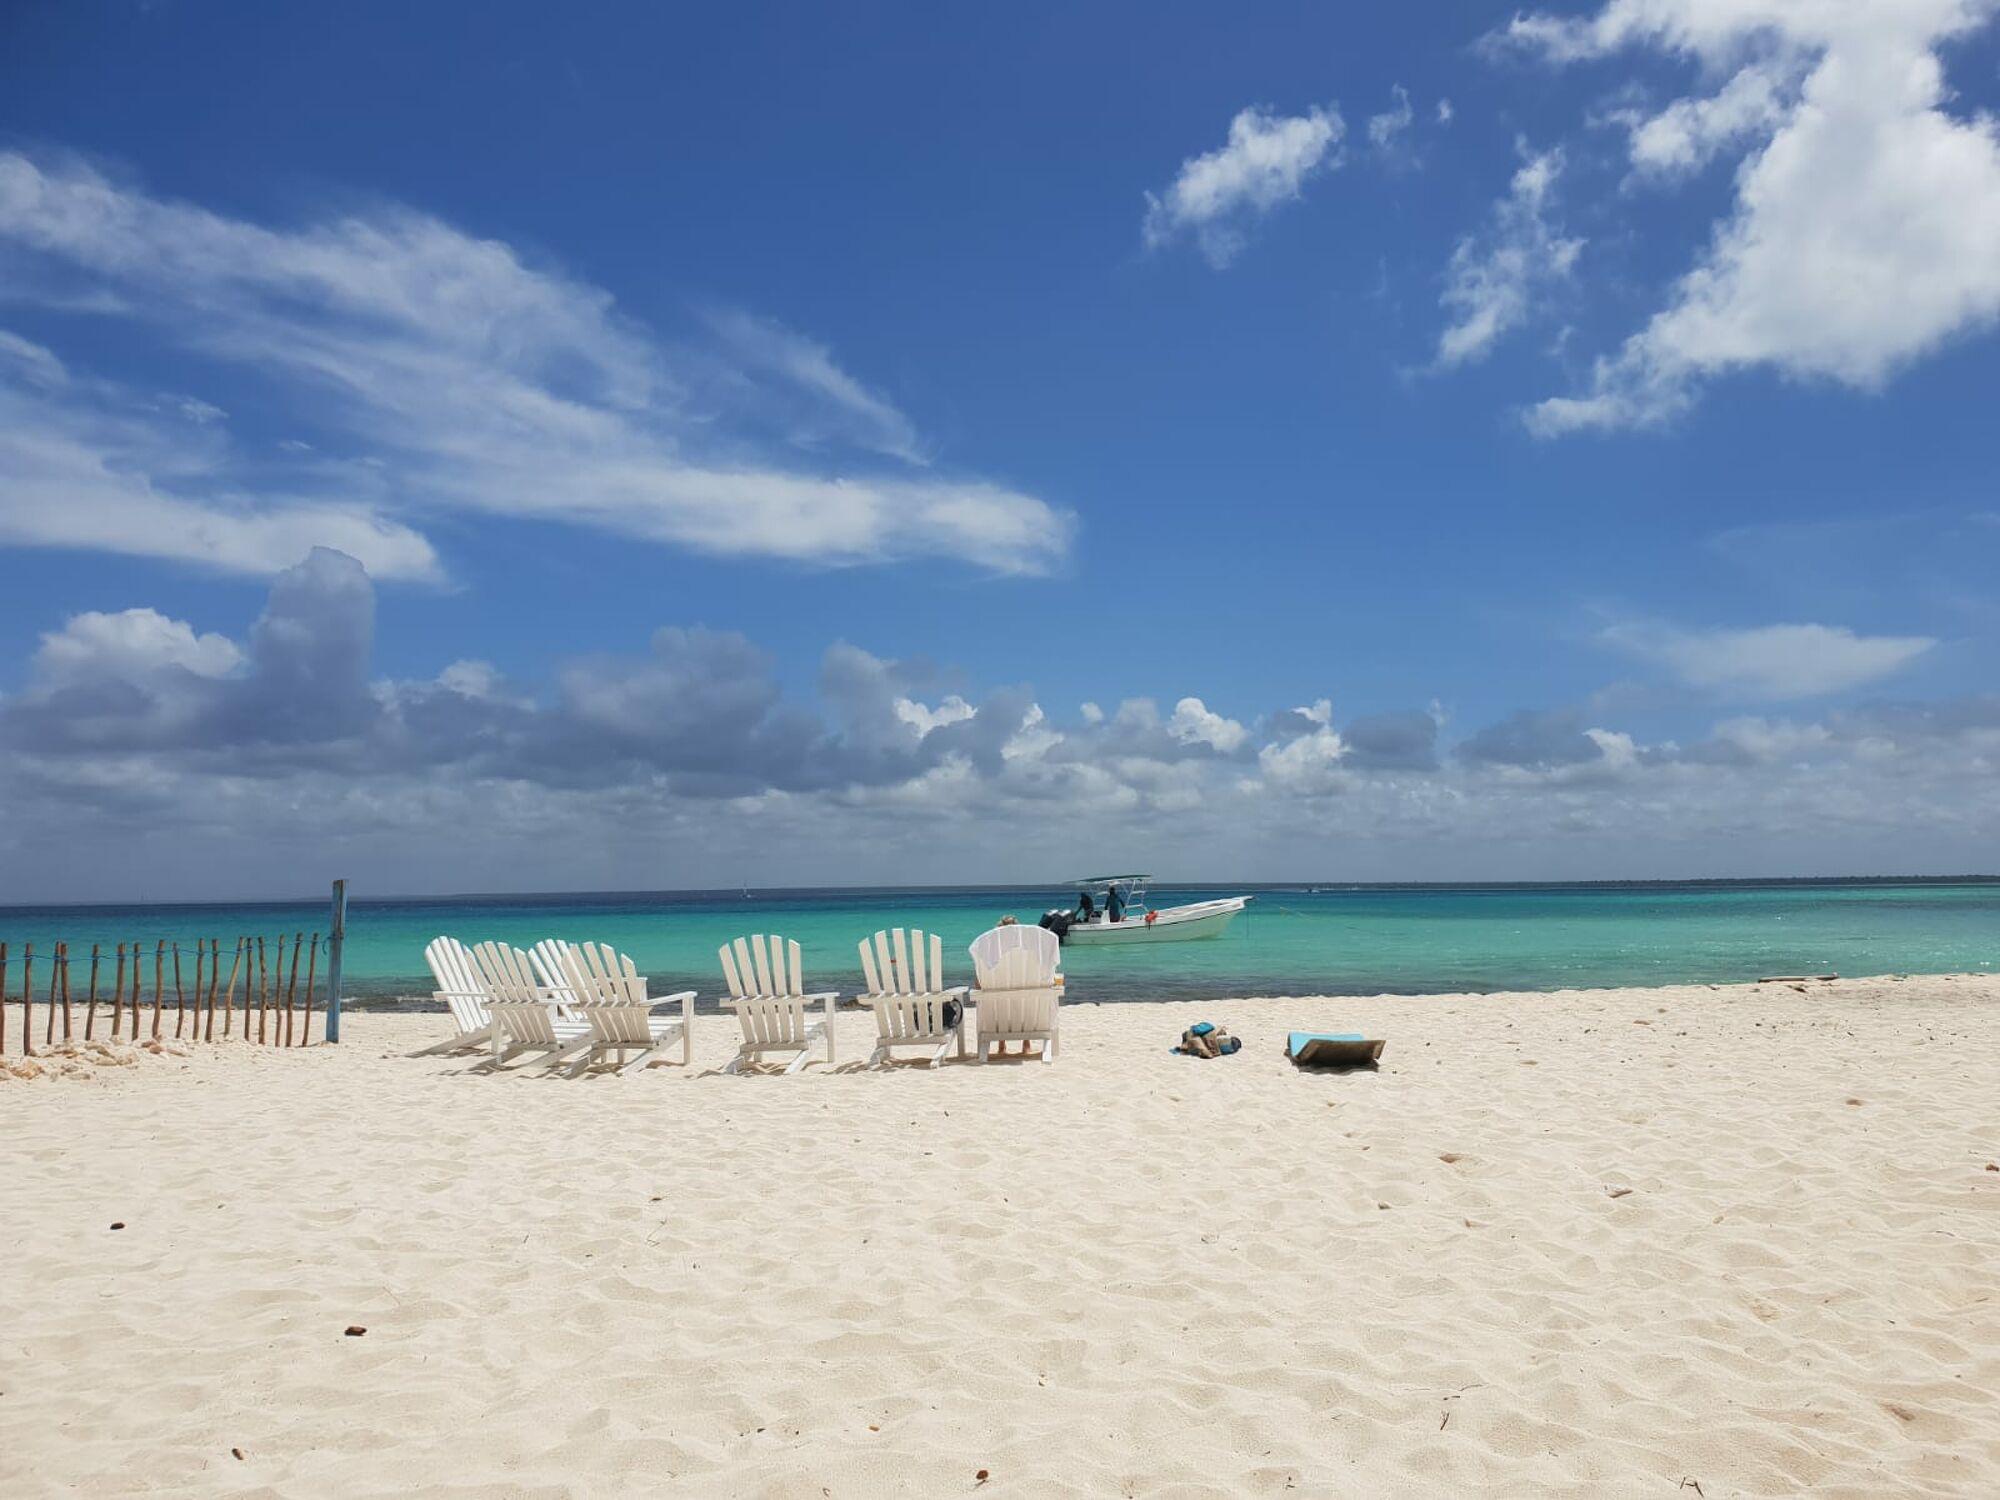 Bild mit Strand, Meer, Dominikanischen Republik, Karibik, Strandurlaub, Badeurlaub